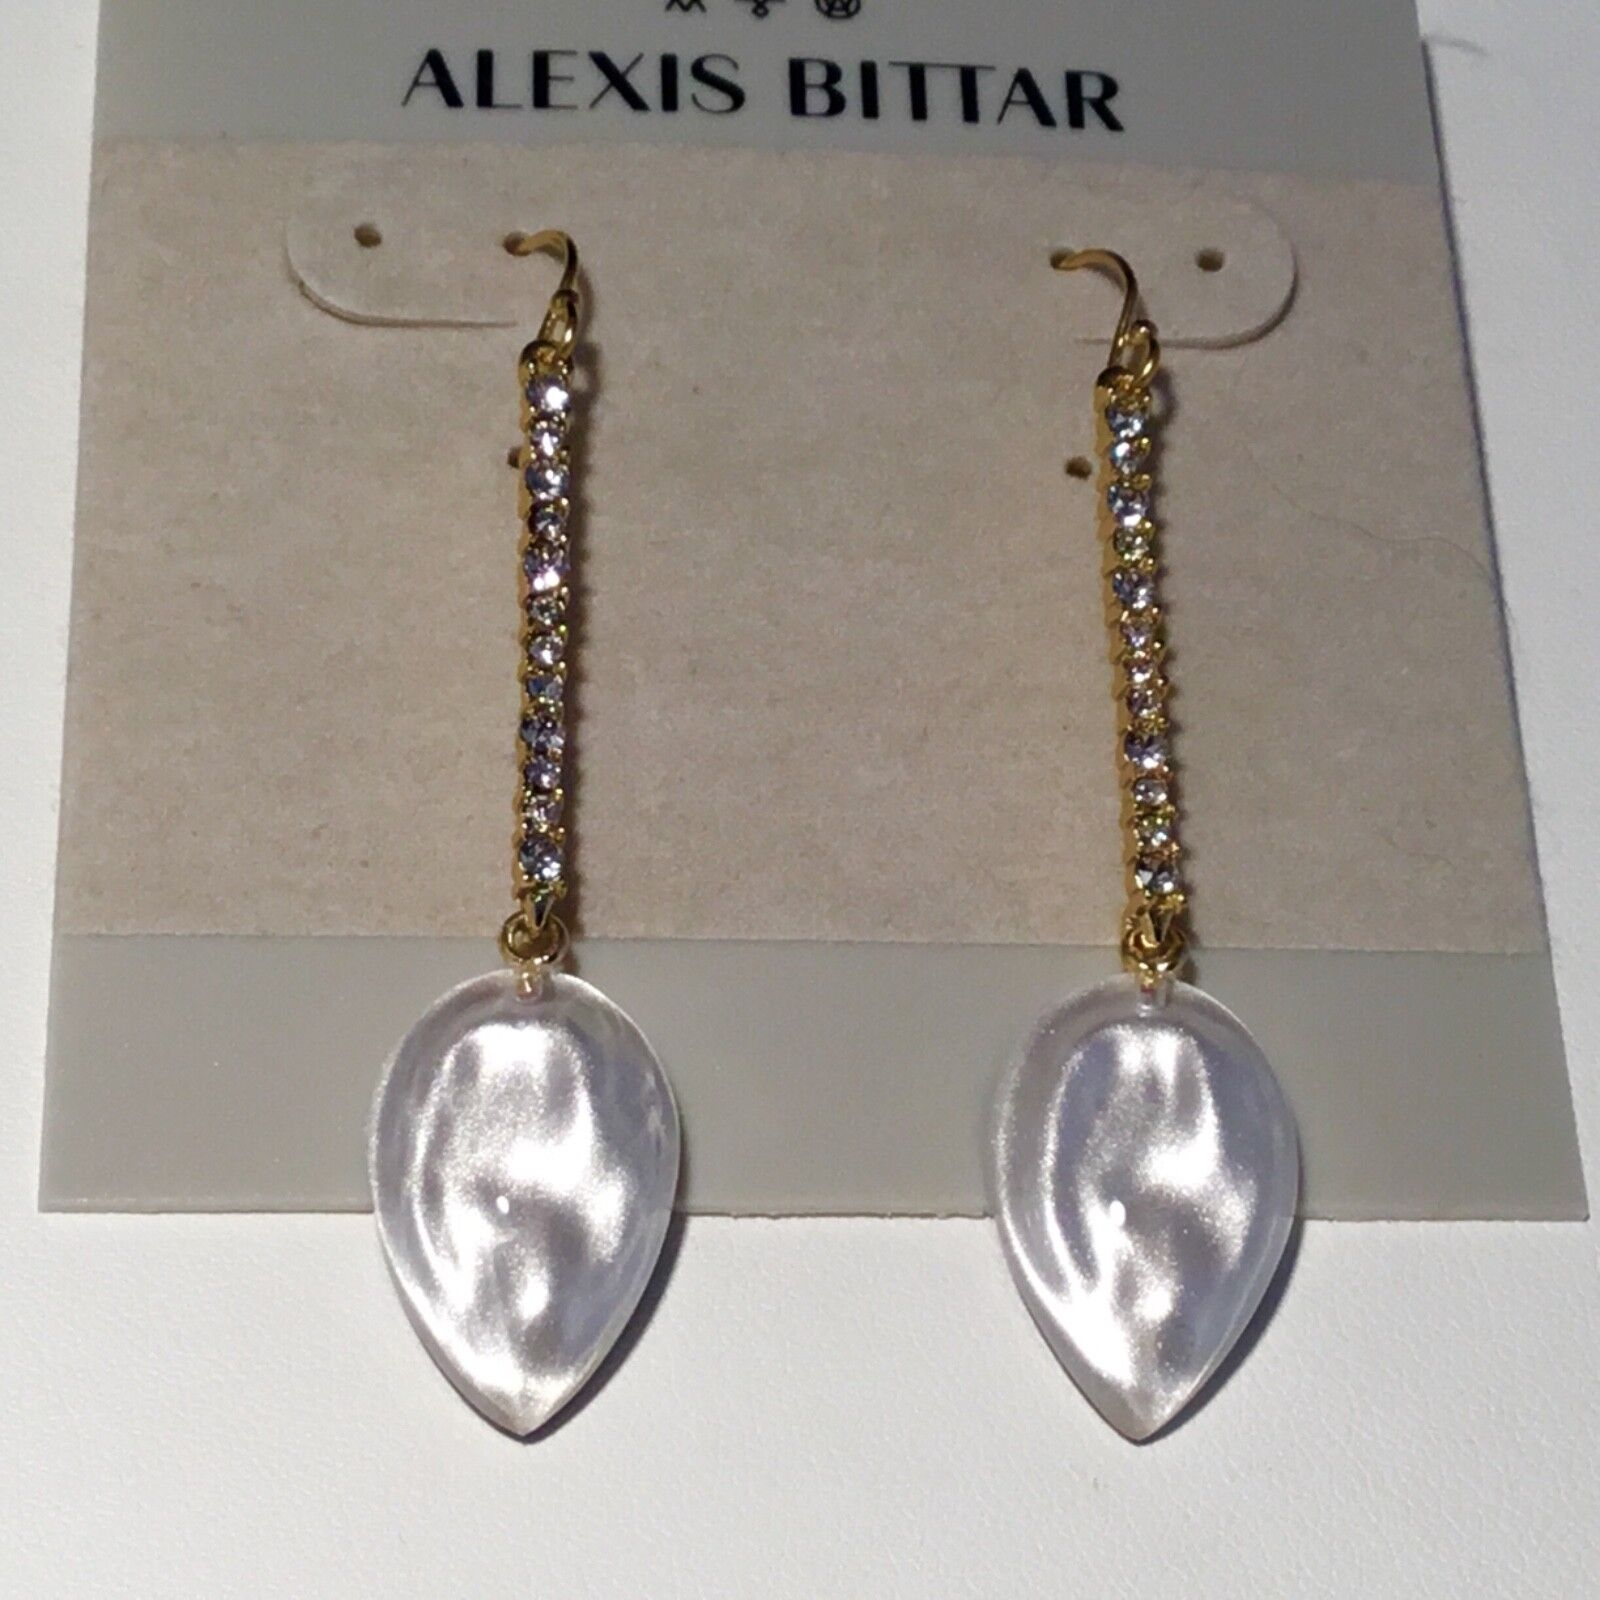 NWOT ALEXIS BITTAR 10 K SWAROVSKI CRYSTAL  LUCITE EARRINGS